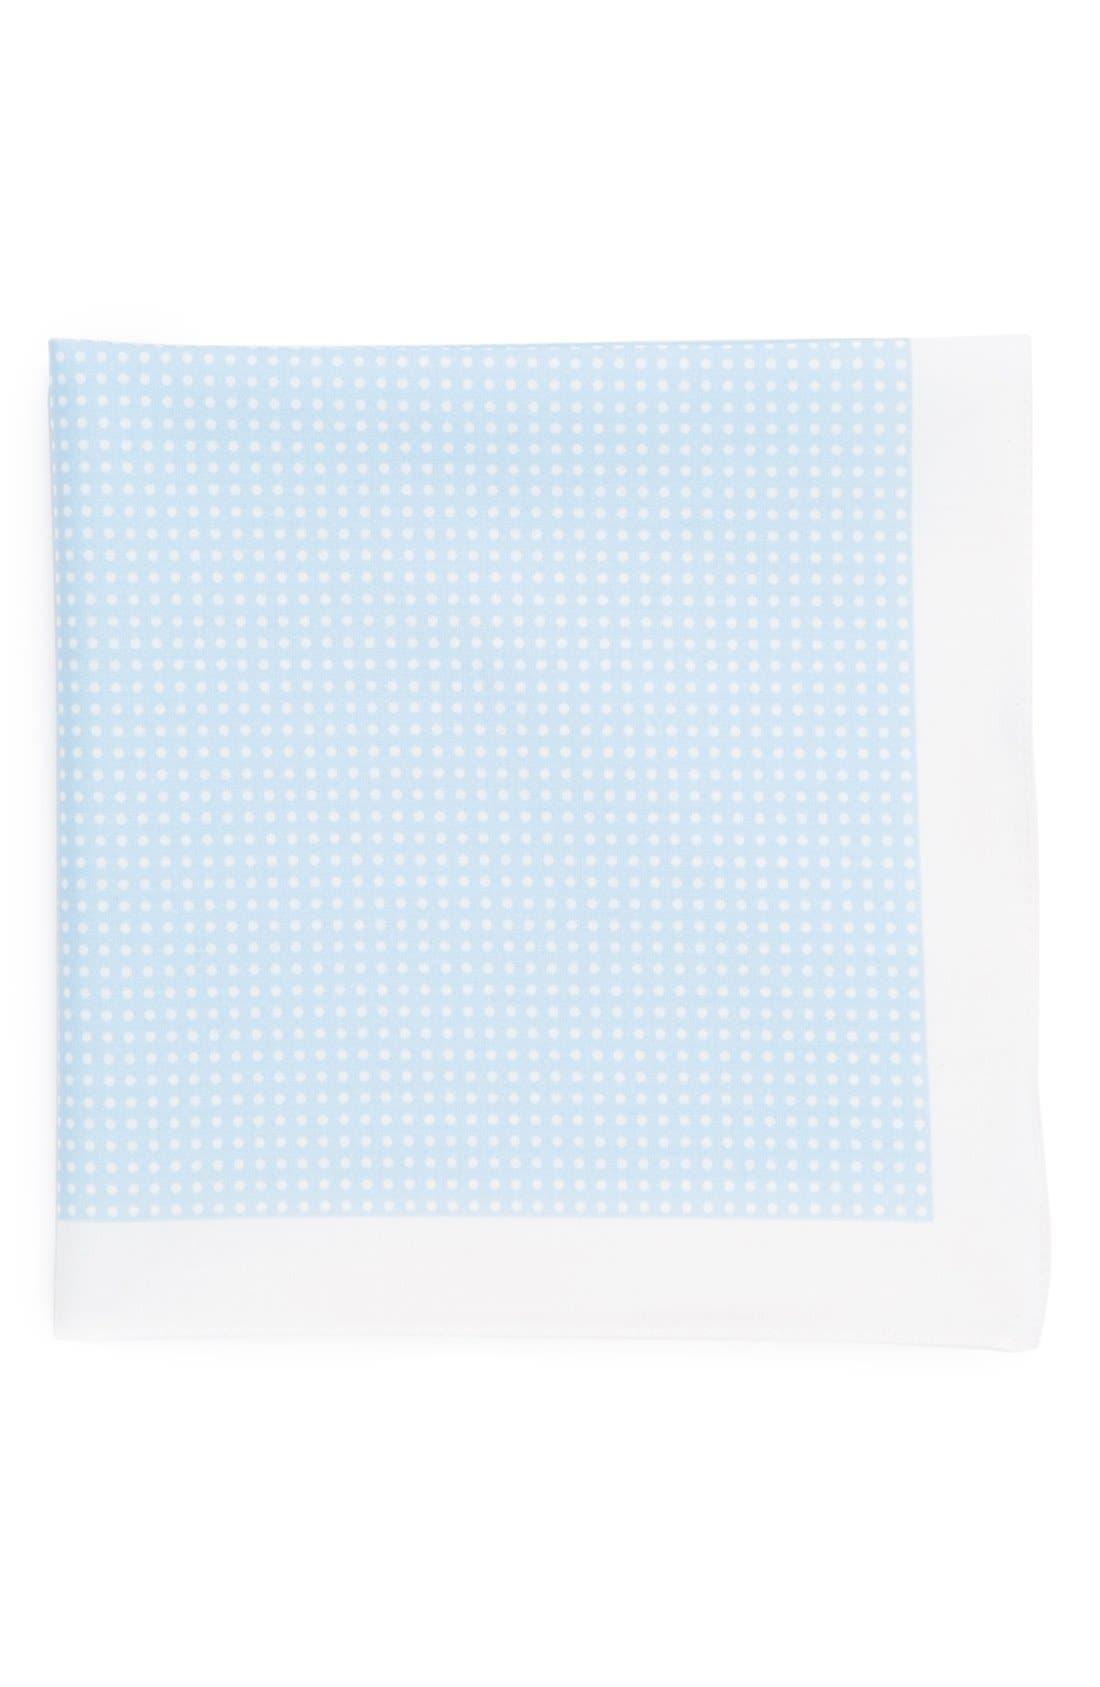 Alternate Image 1 Selected - BOSS HUGO BOSS Cotton Pocket Square